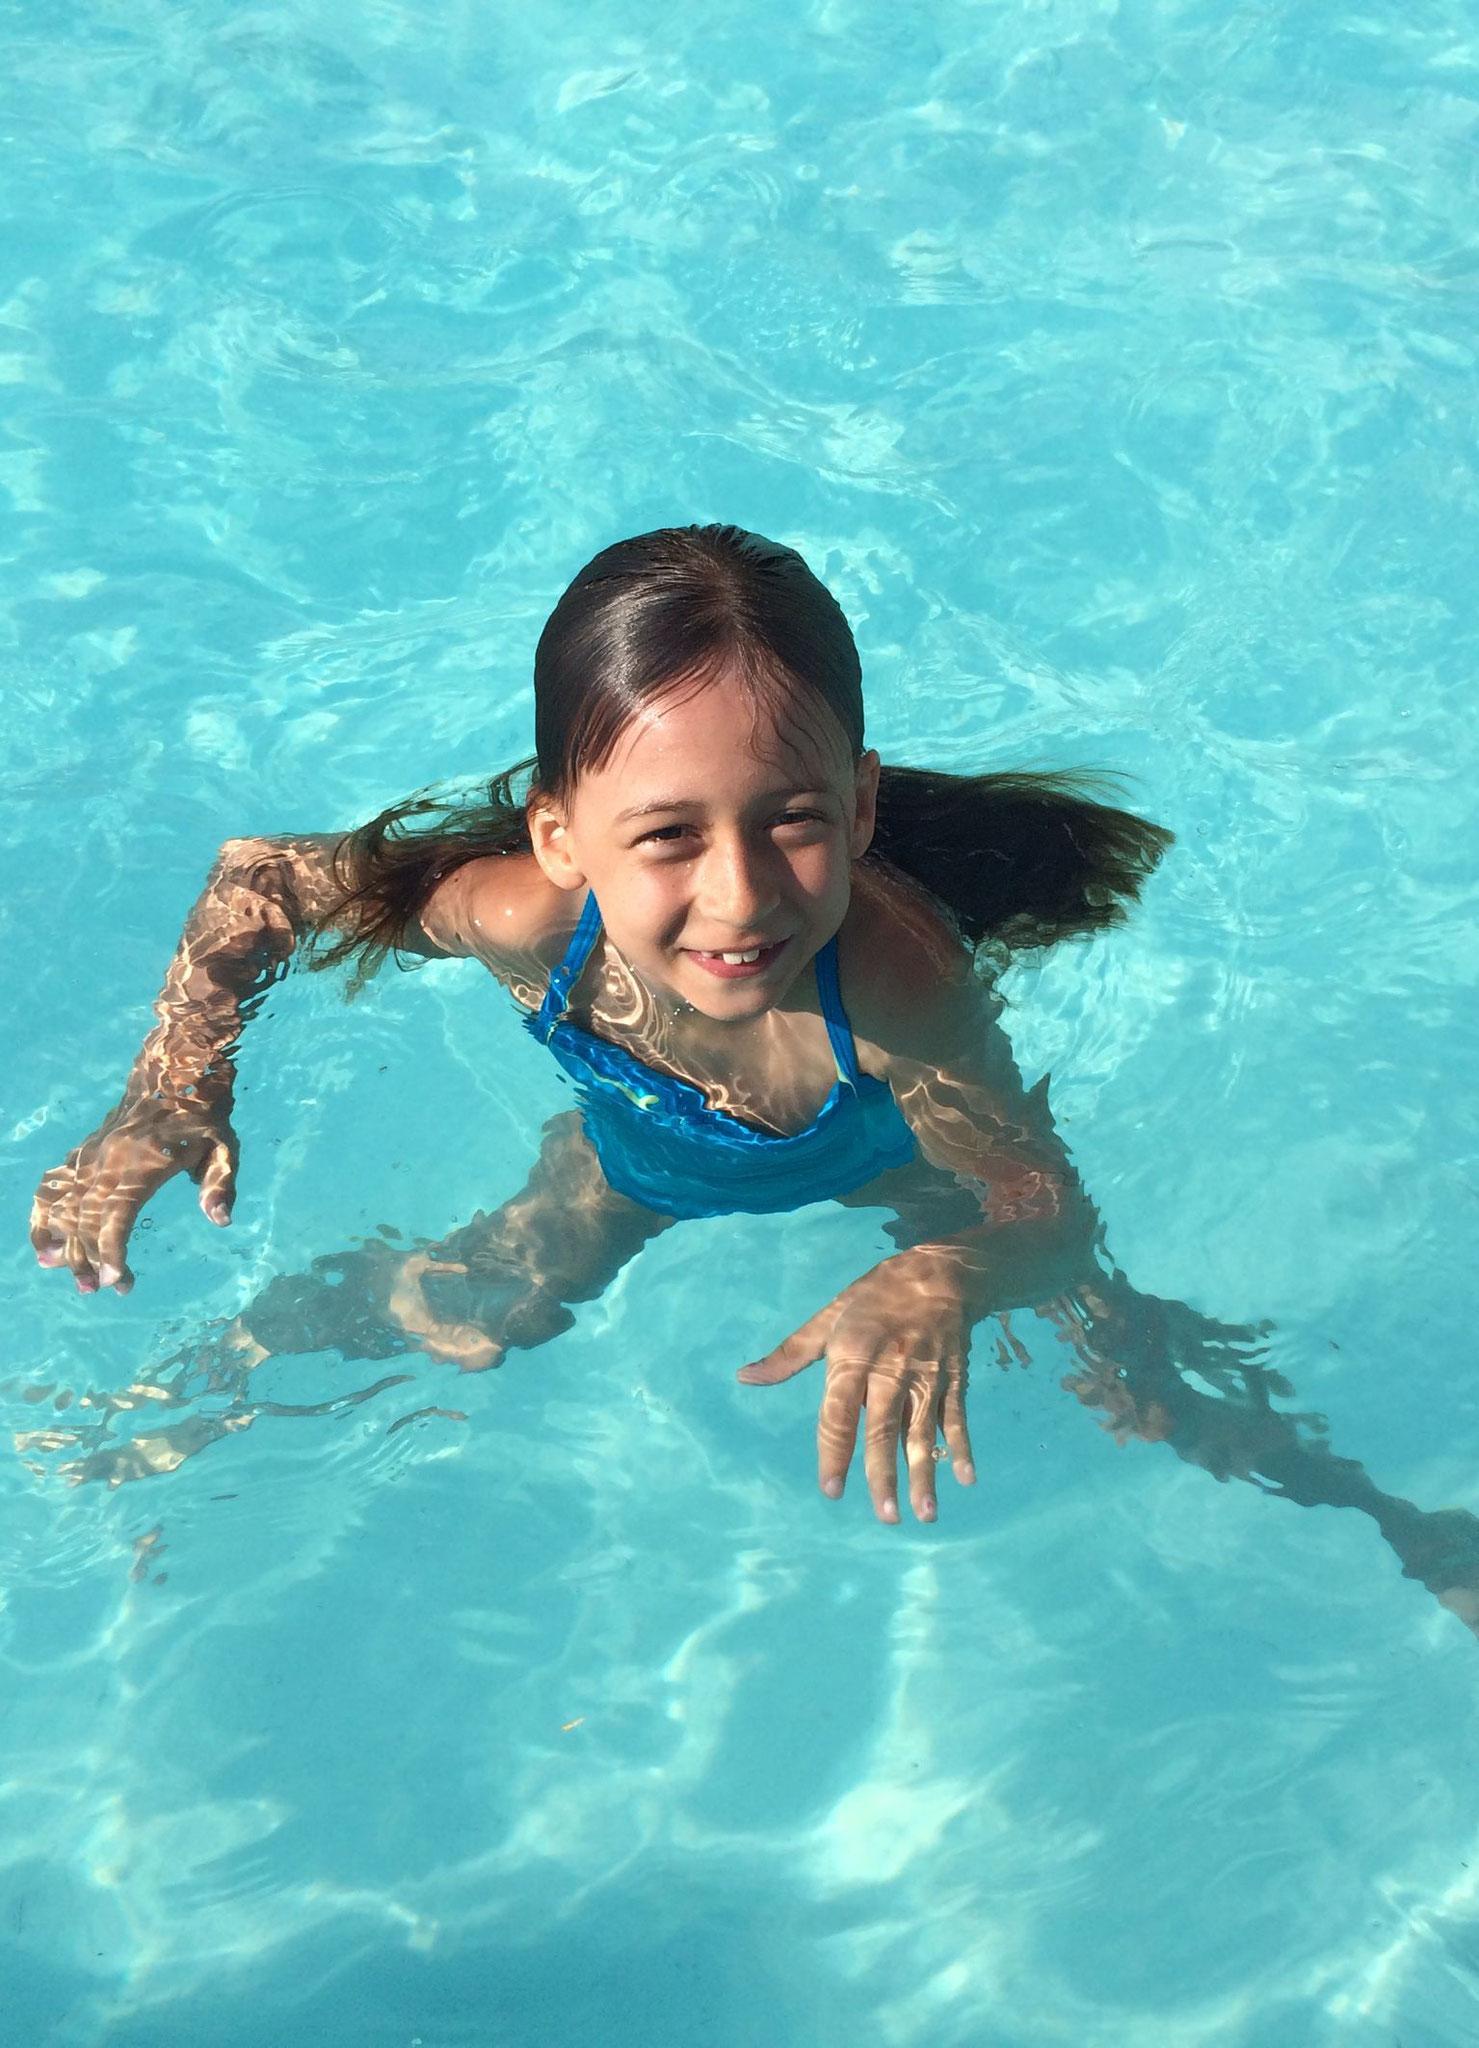 Juli 2016 auf Mallorca im Pool